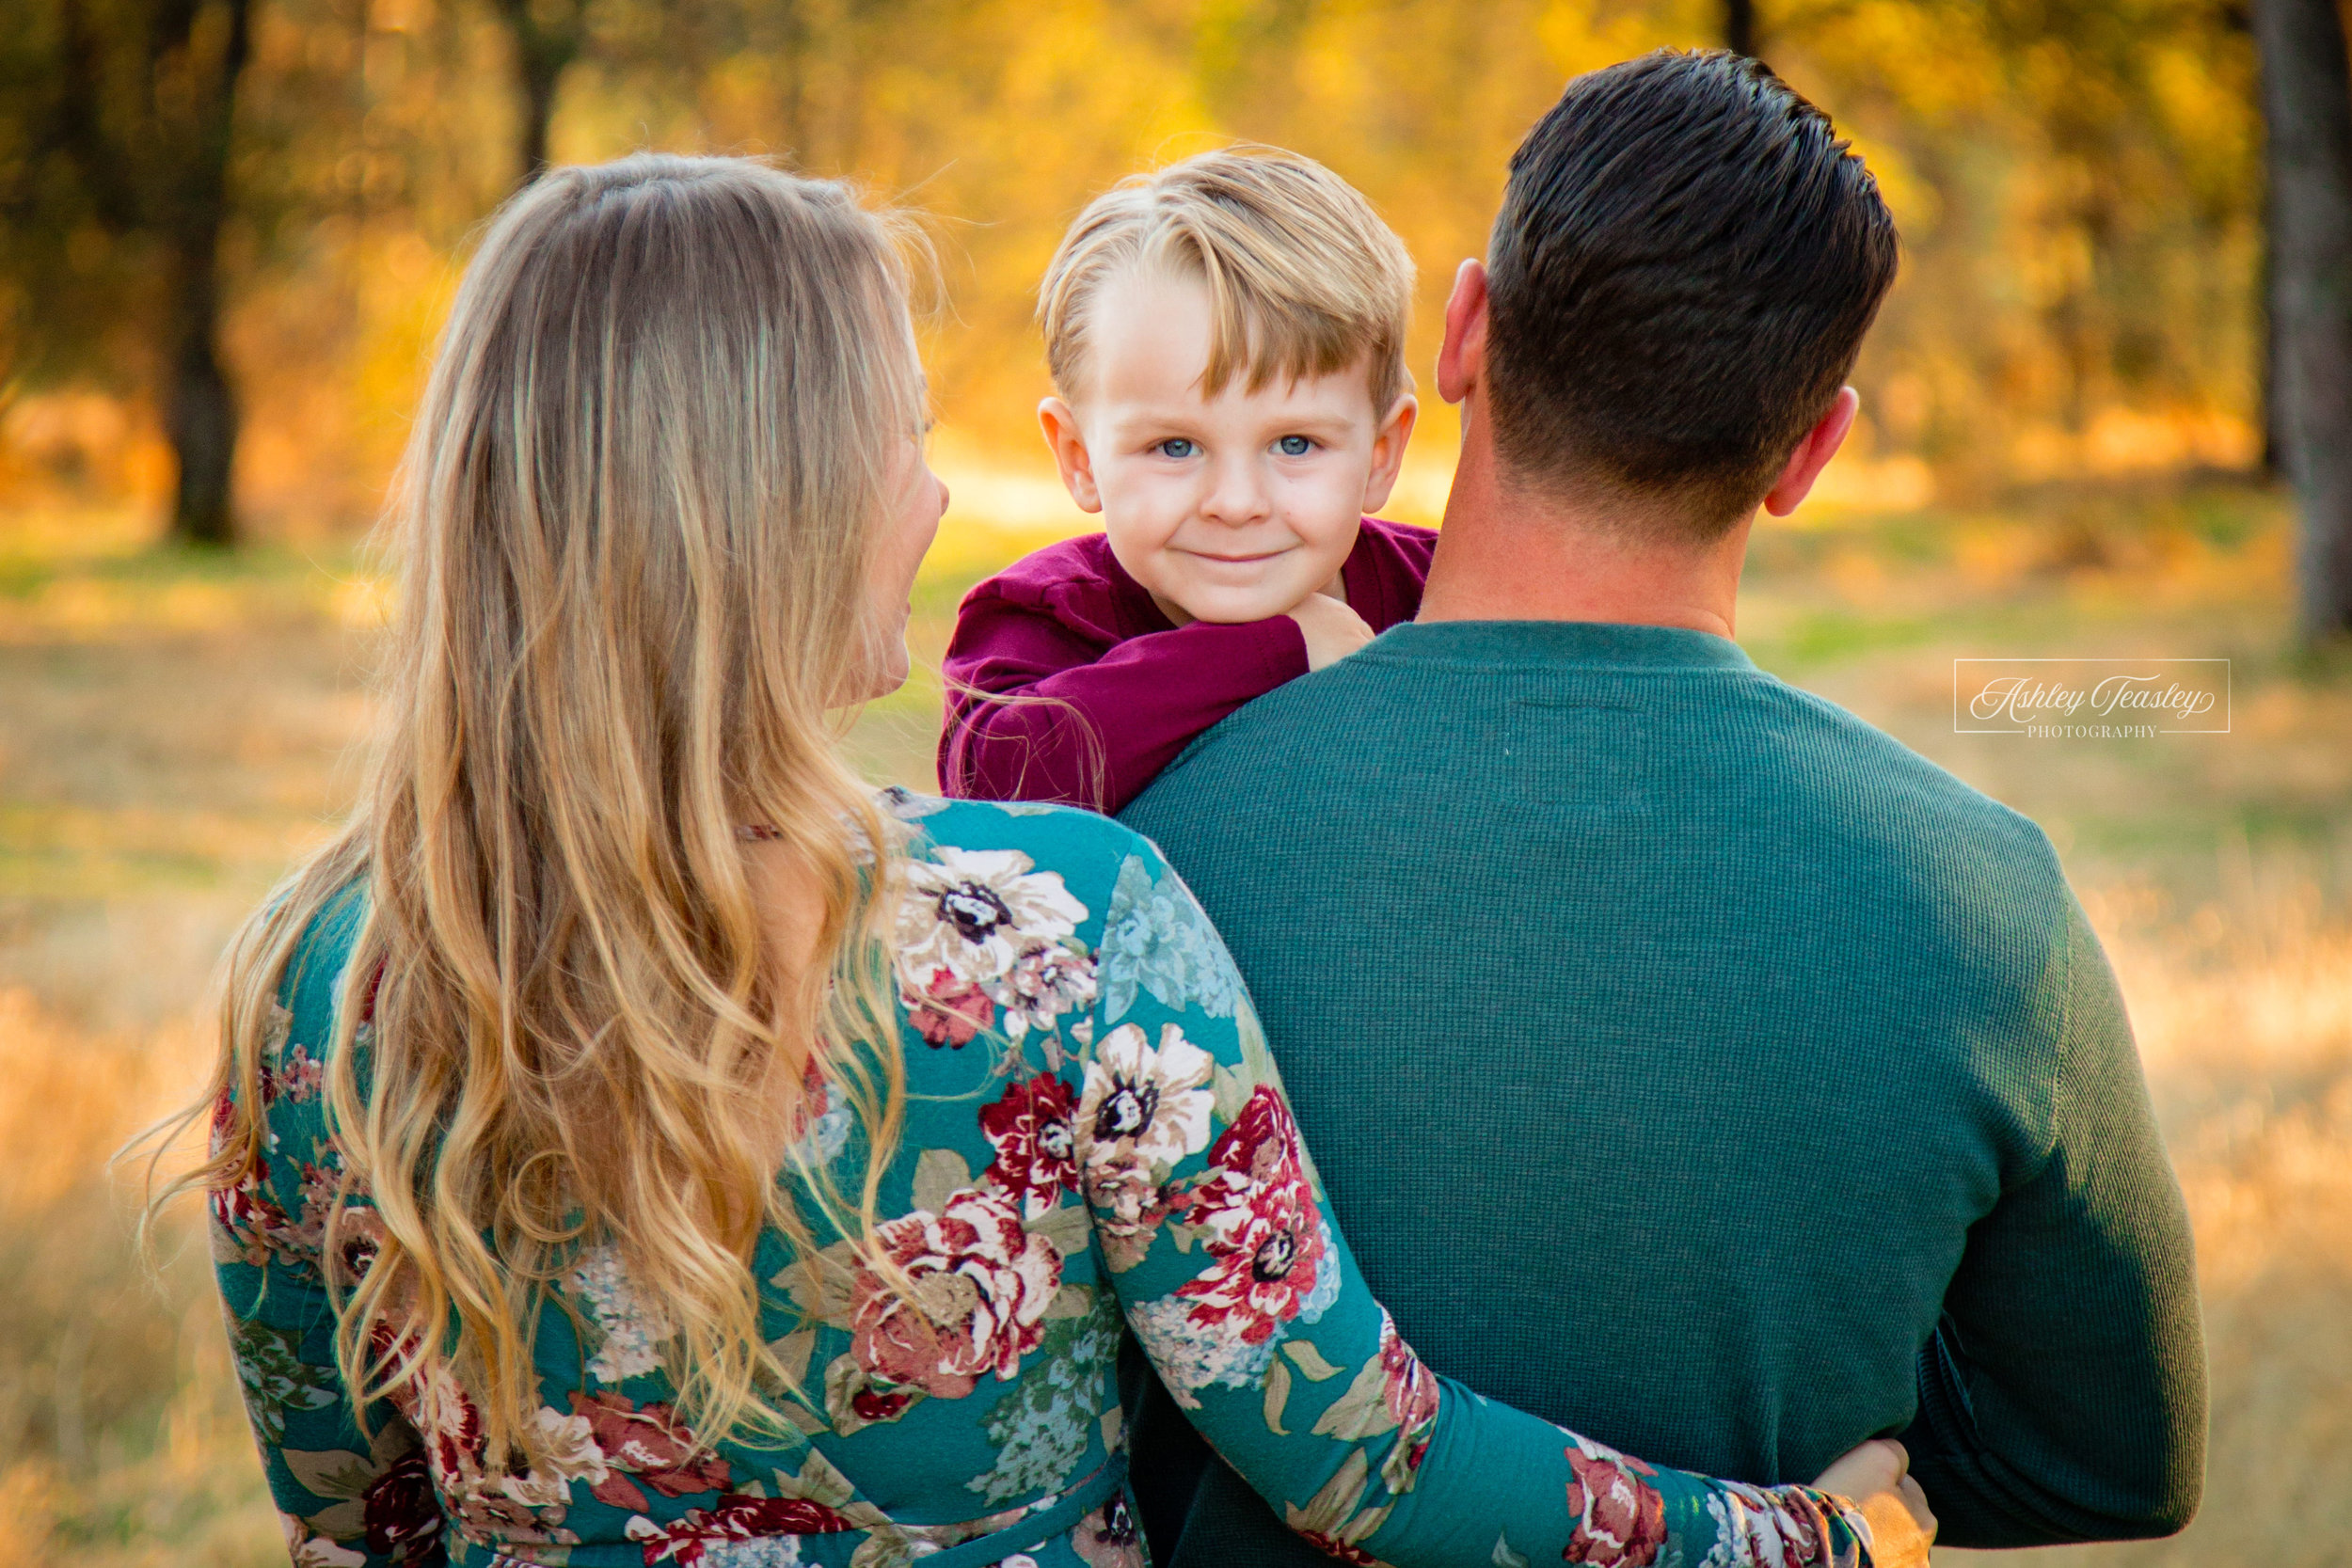 Family Session - Maternity Session - Sacramento Wedding Photographer - Ashley Teasley Photography-18.jpg